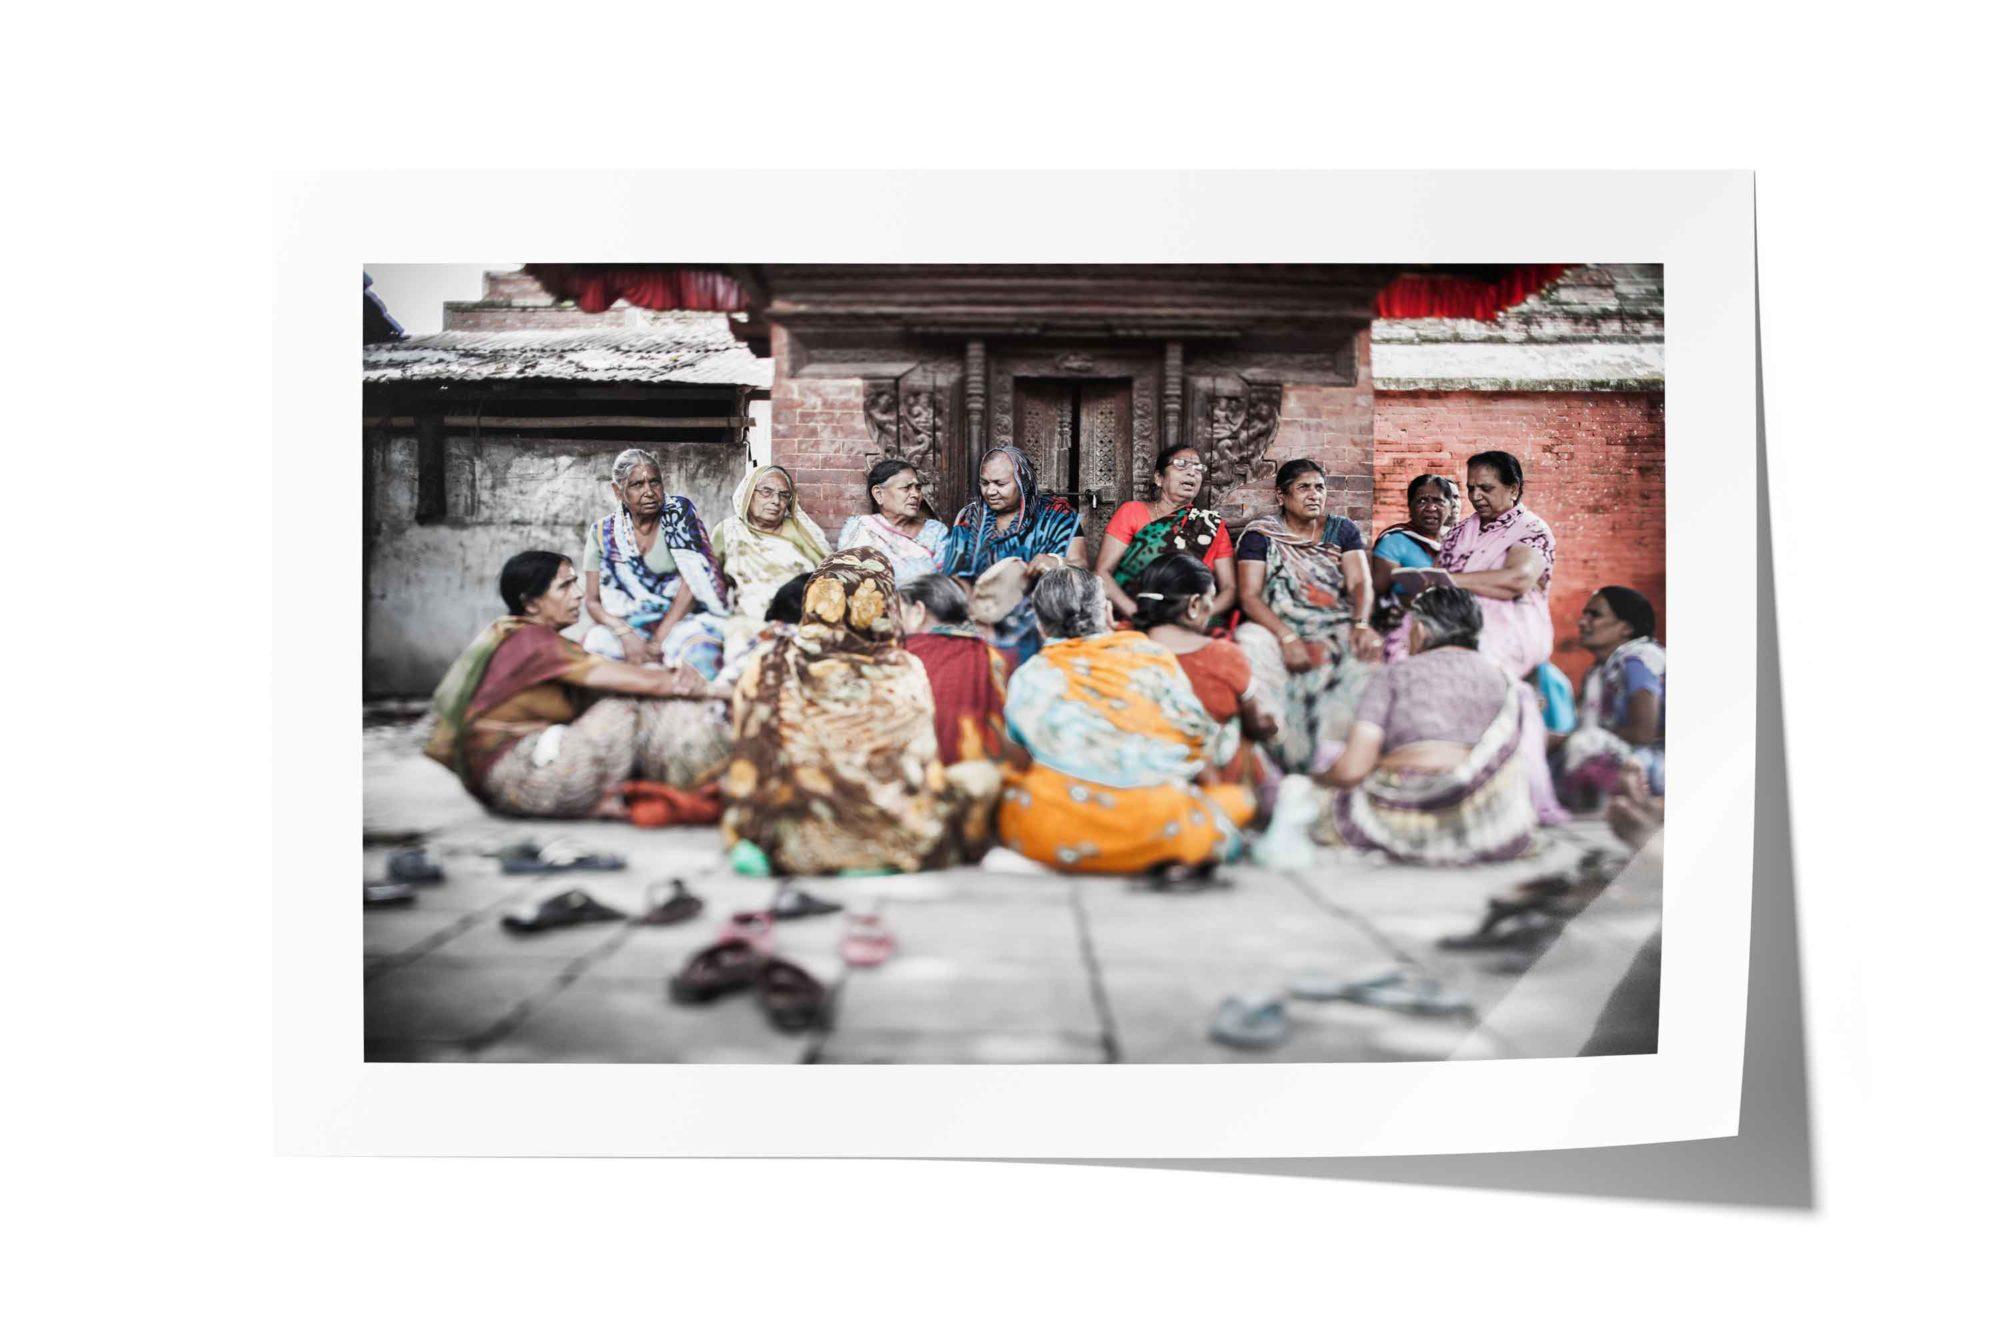 Street Art Image, Close to Durbar Square, Kathmandu Nepal